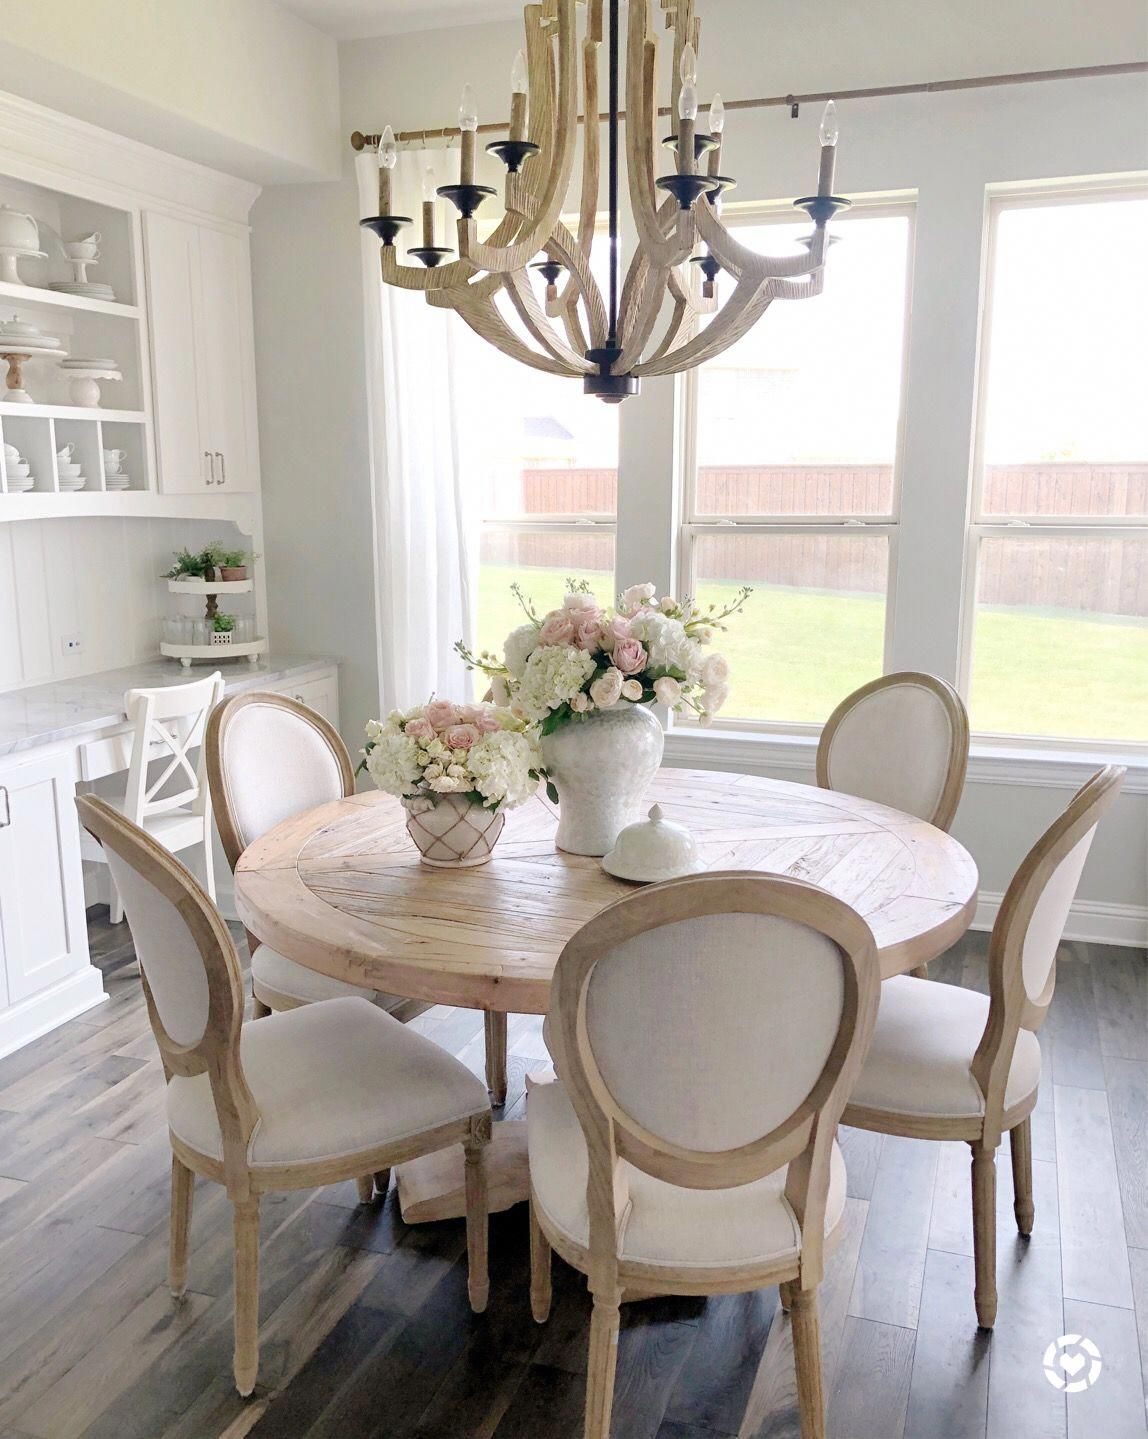 Luxury Furniture Los Angeles Shippingfurniturecost Kitchen Nook